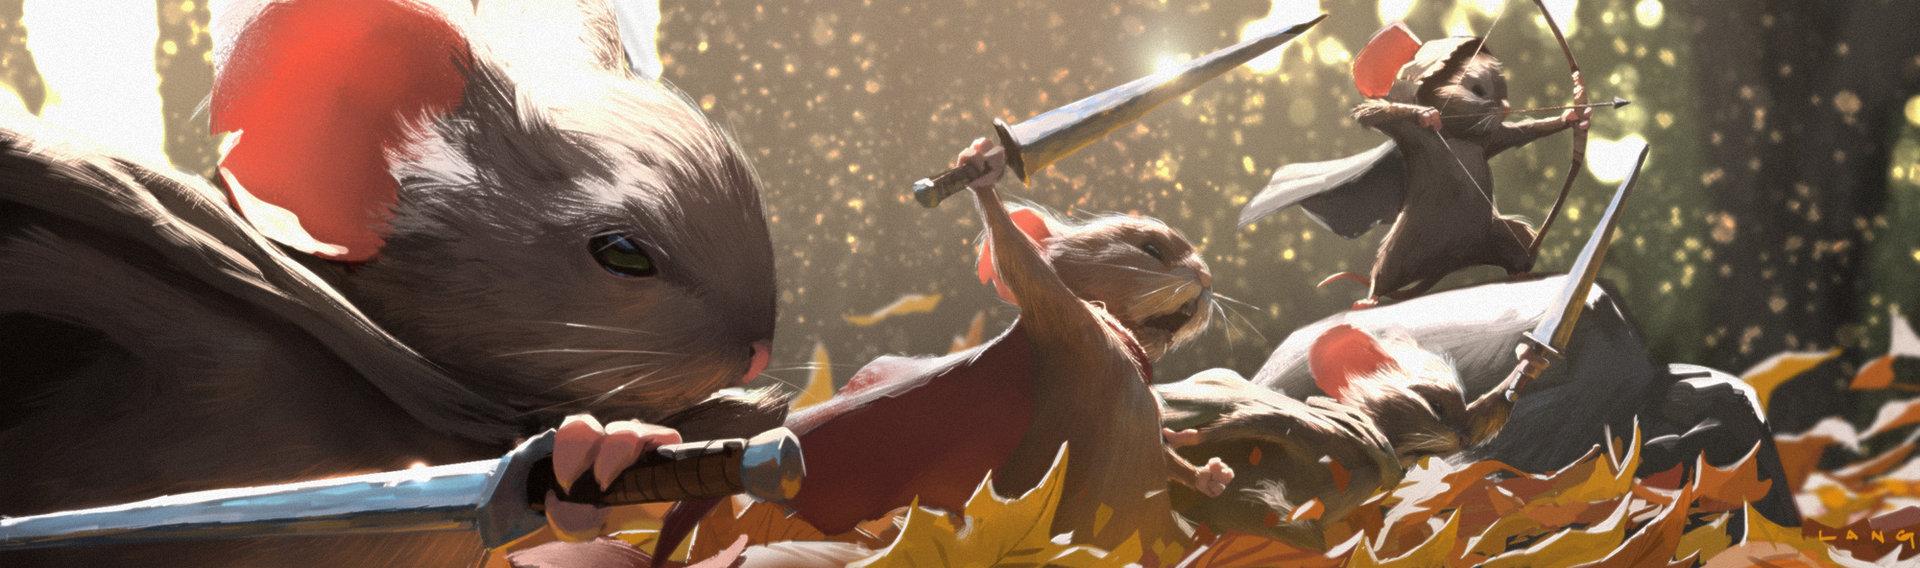 Ryan Lang's Mouseguard painting